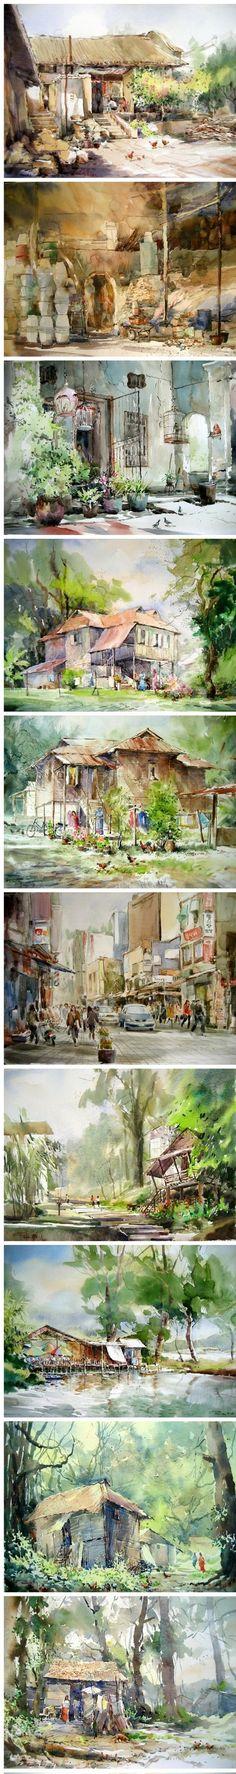 Phang Chew水彩 #watercolor jd